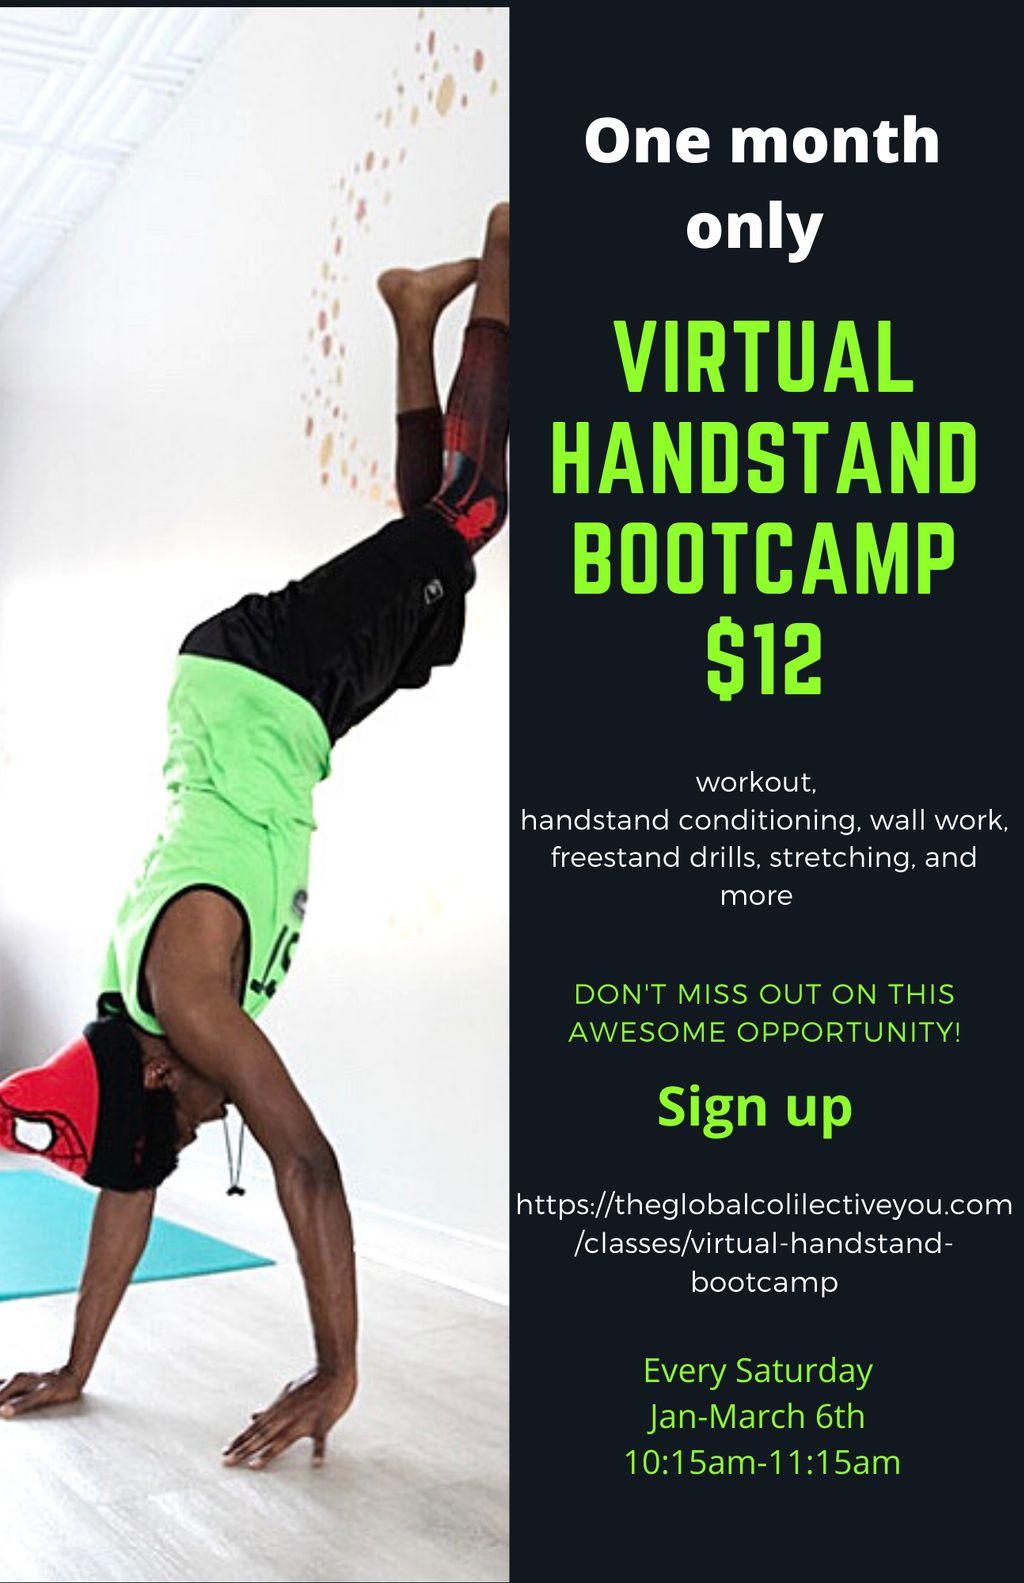 Virtual Handstand Bootcamp Saturday classes